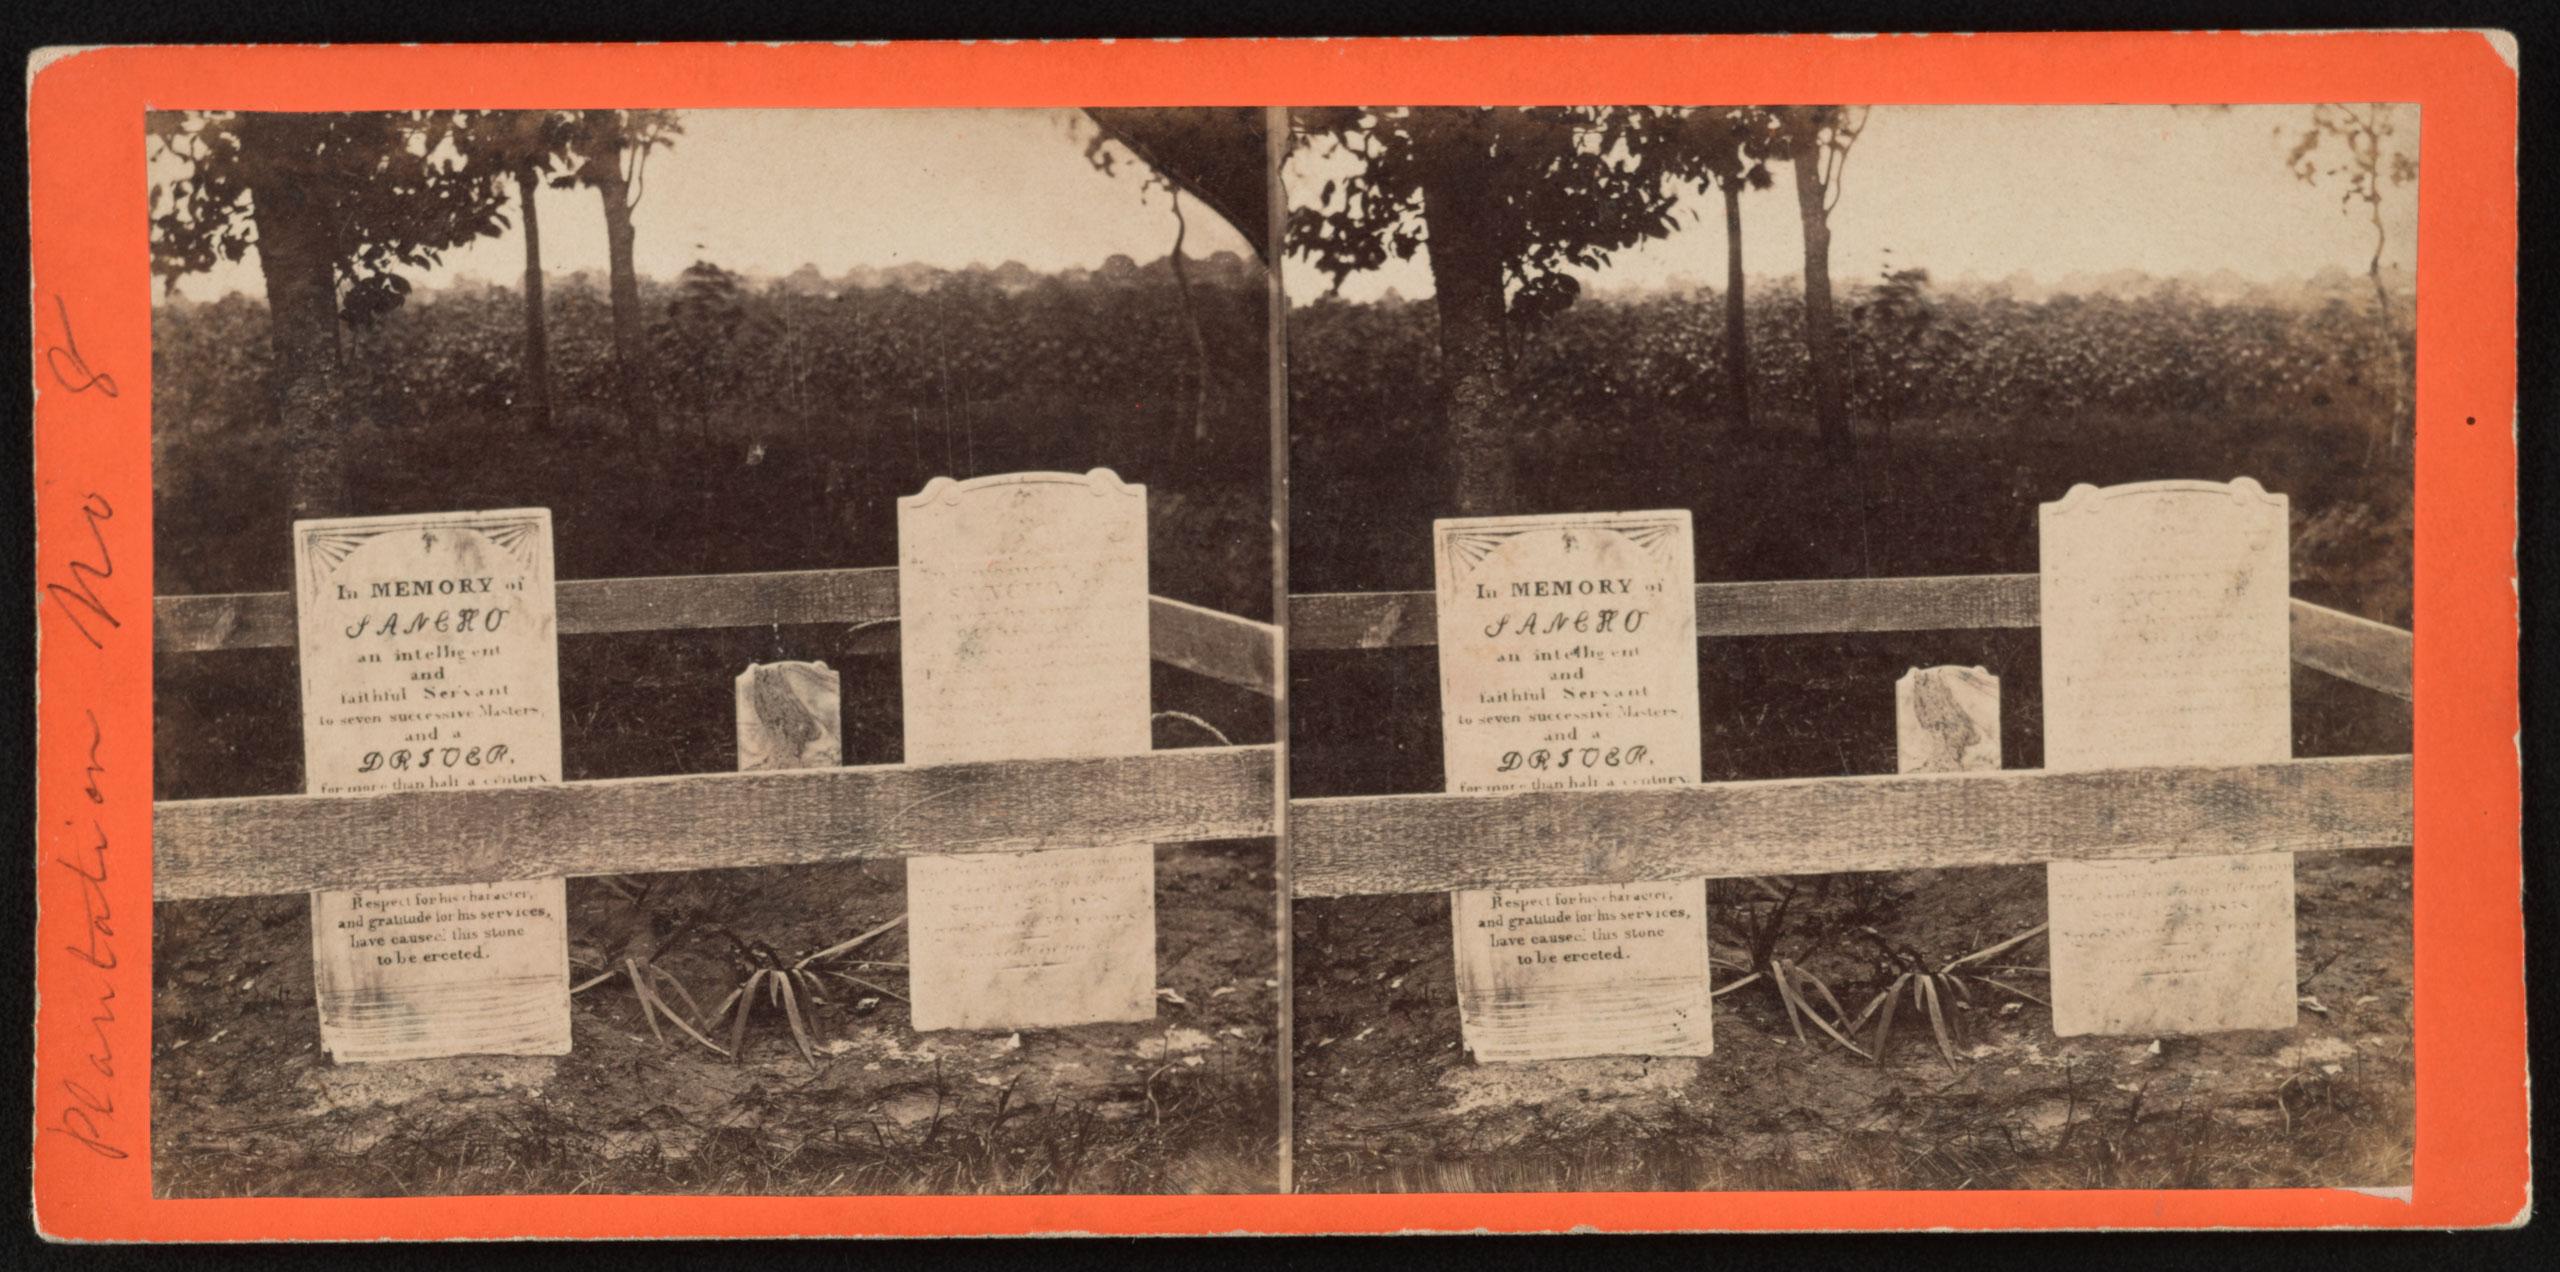 A negro burying ground,  Rockville plantation, Charleston, S.C., January 1863.